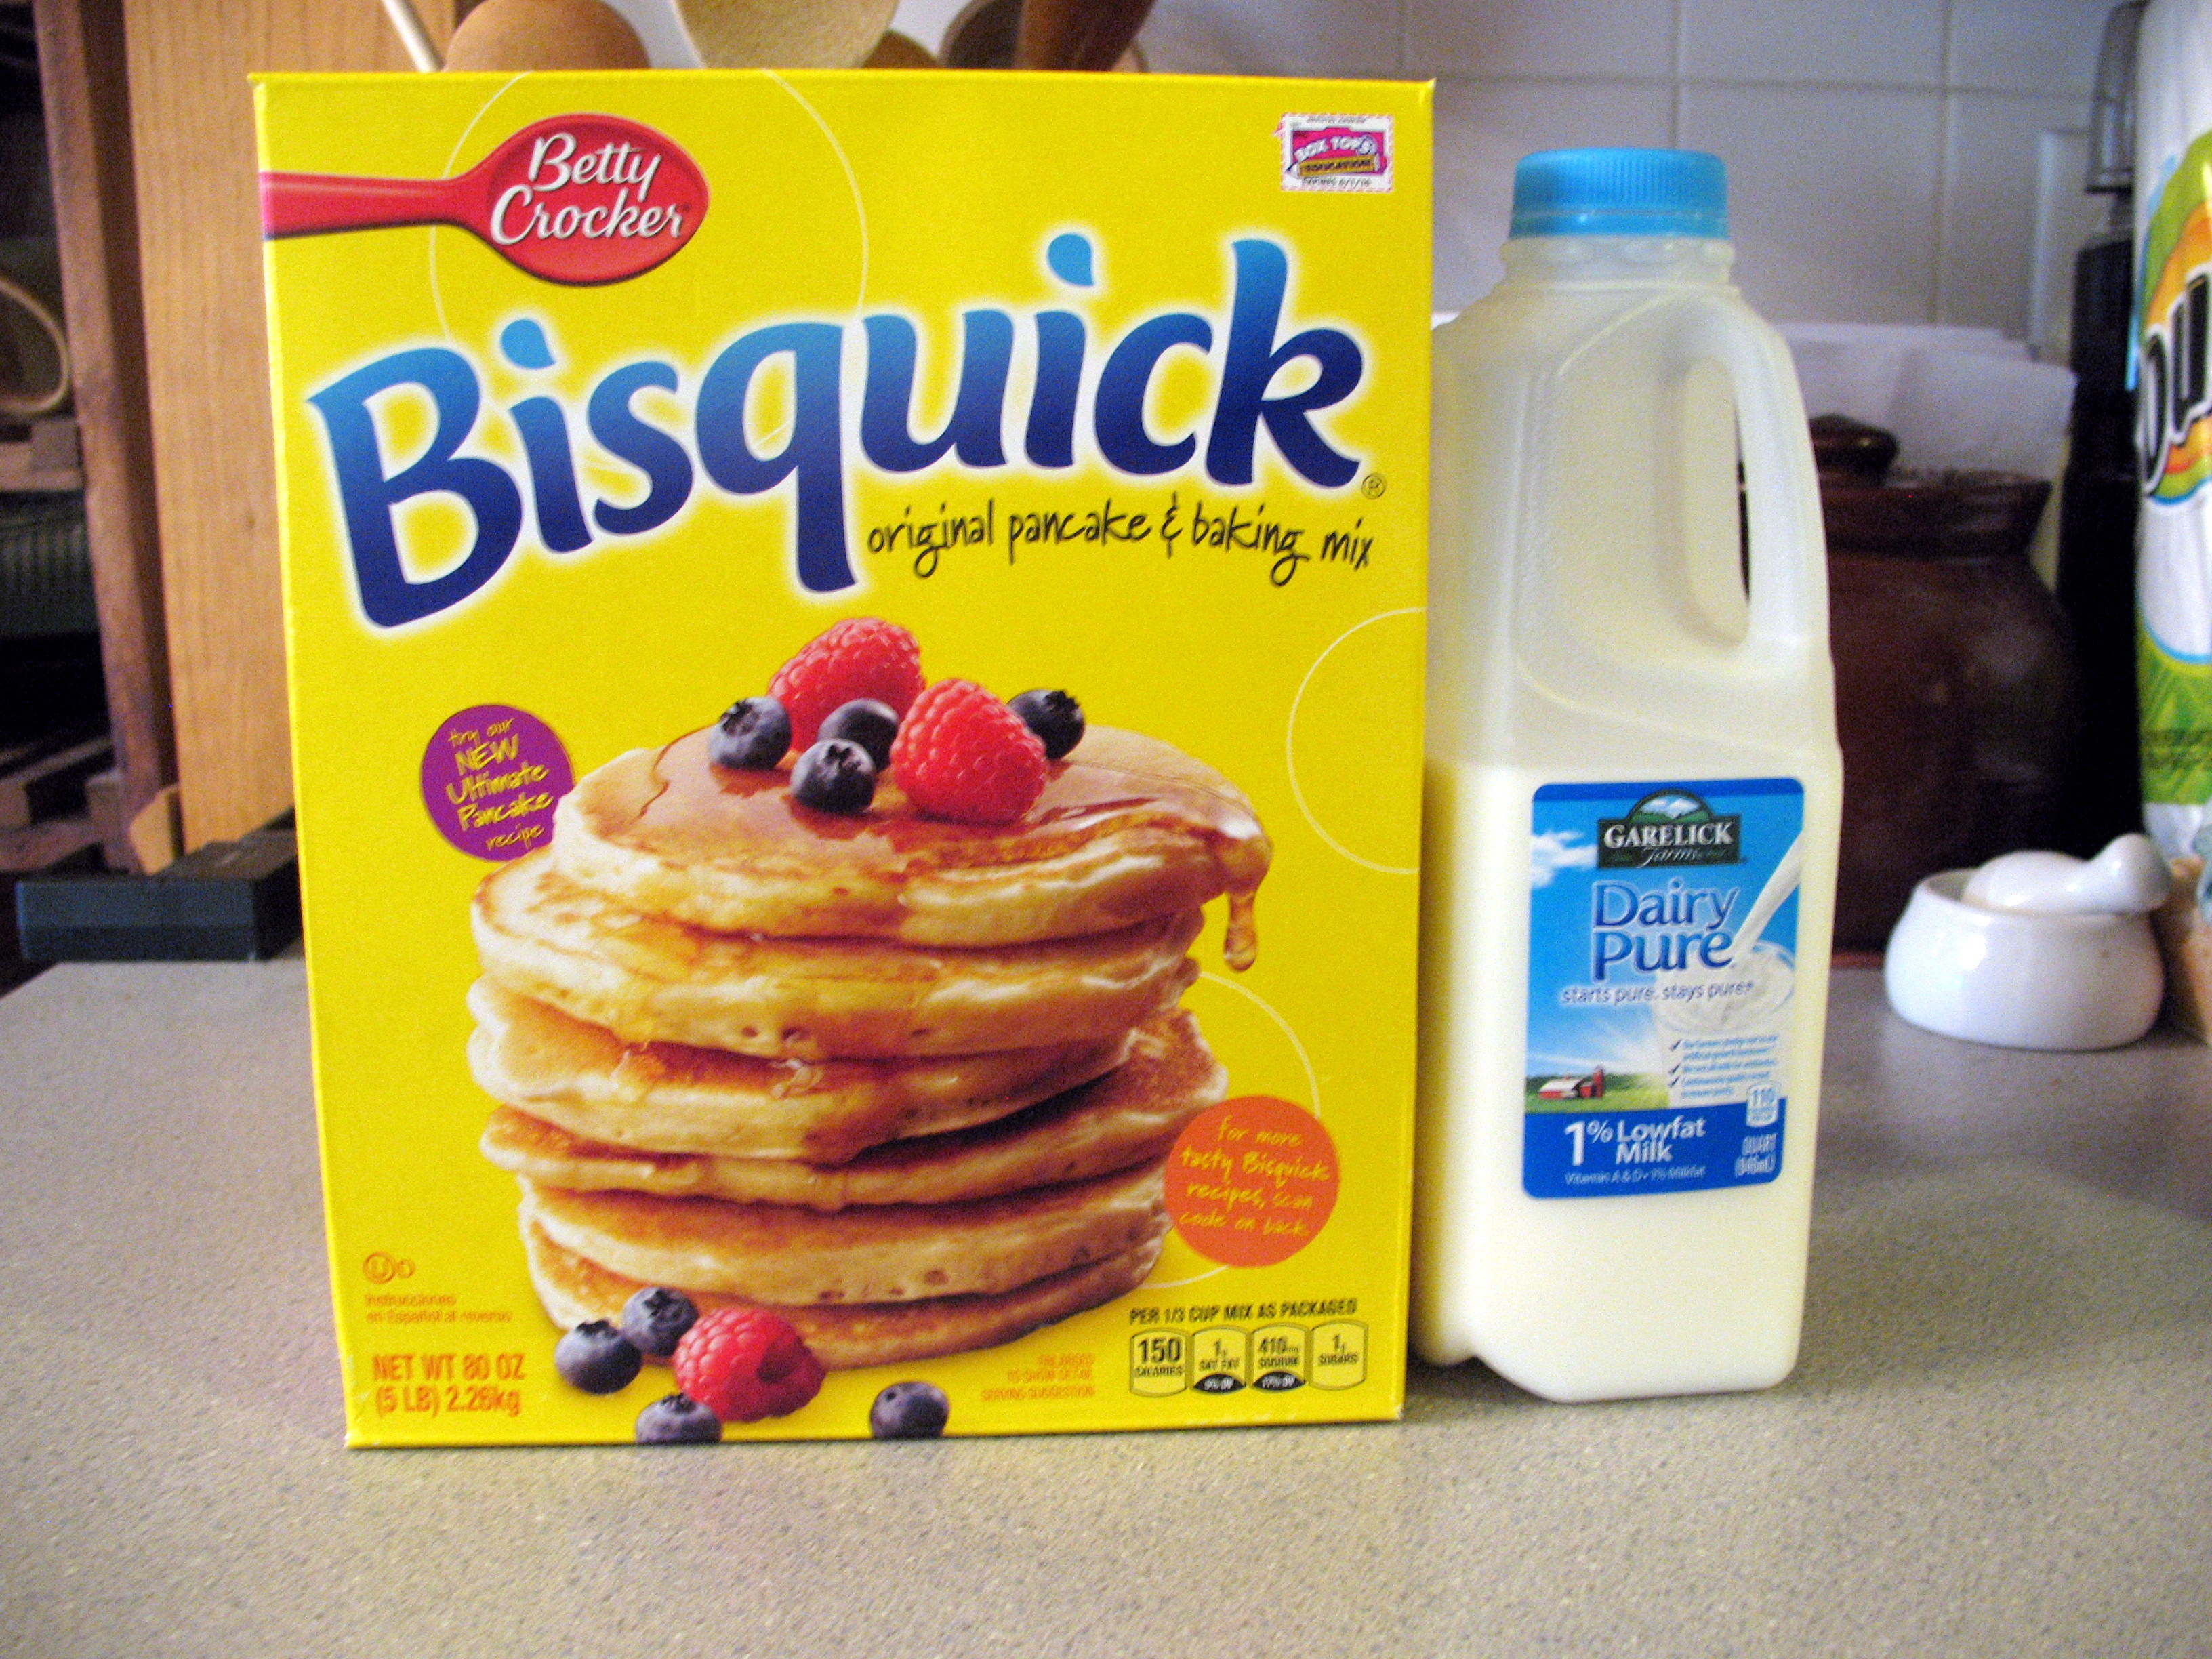 Bisquick Biscuits Recipe On Box